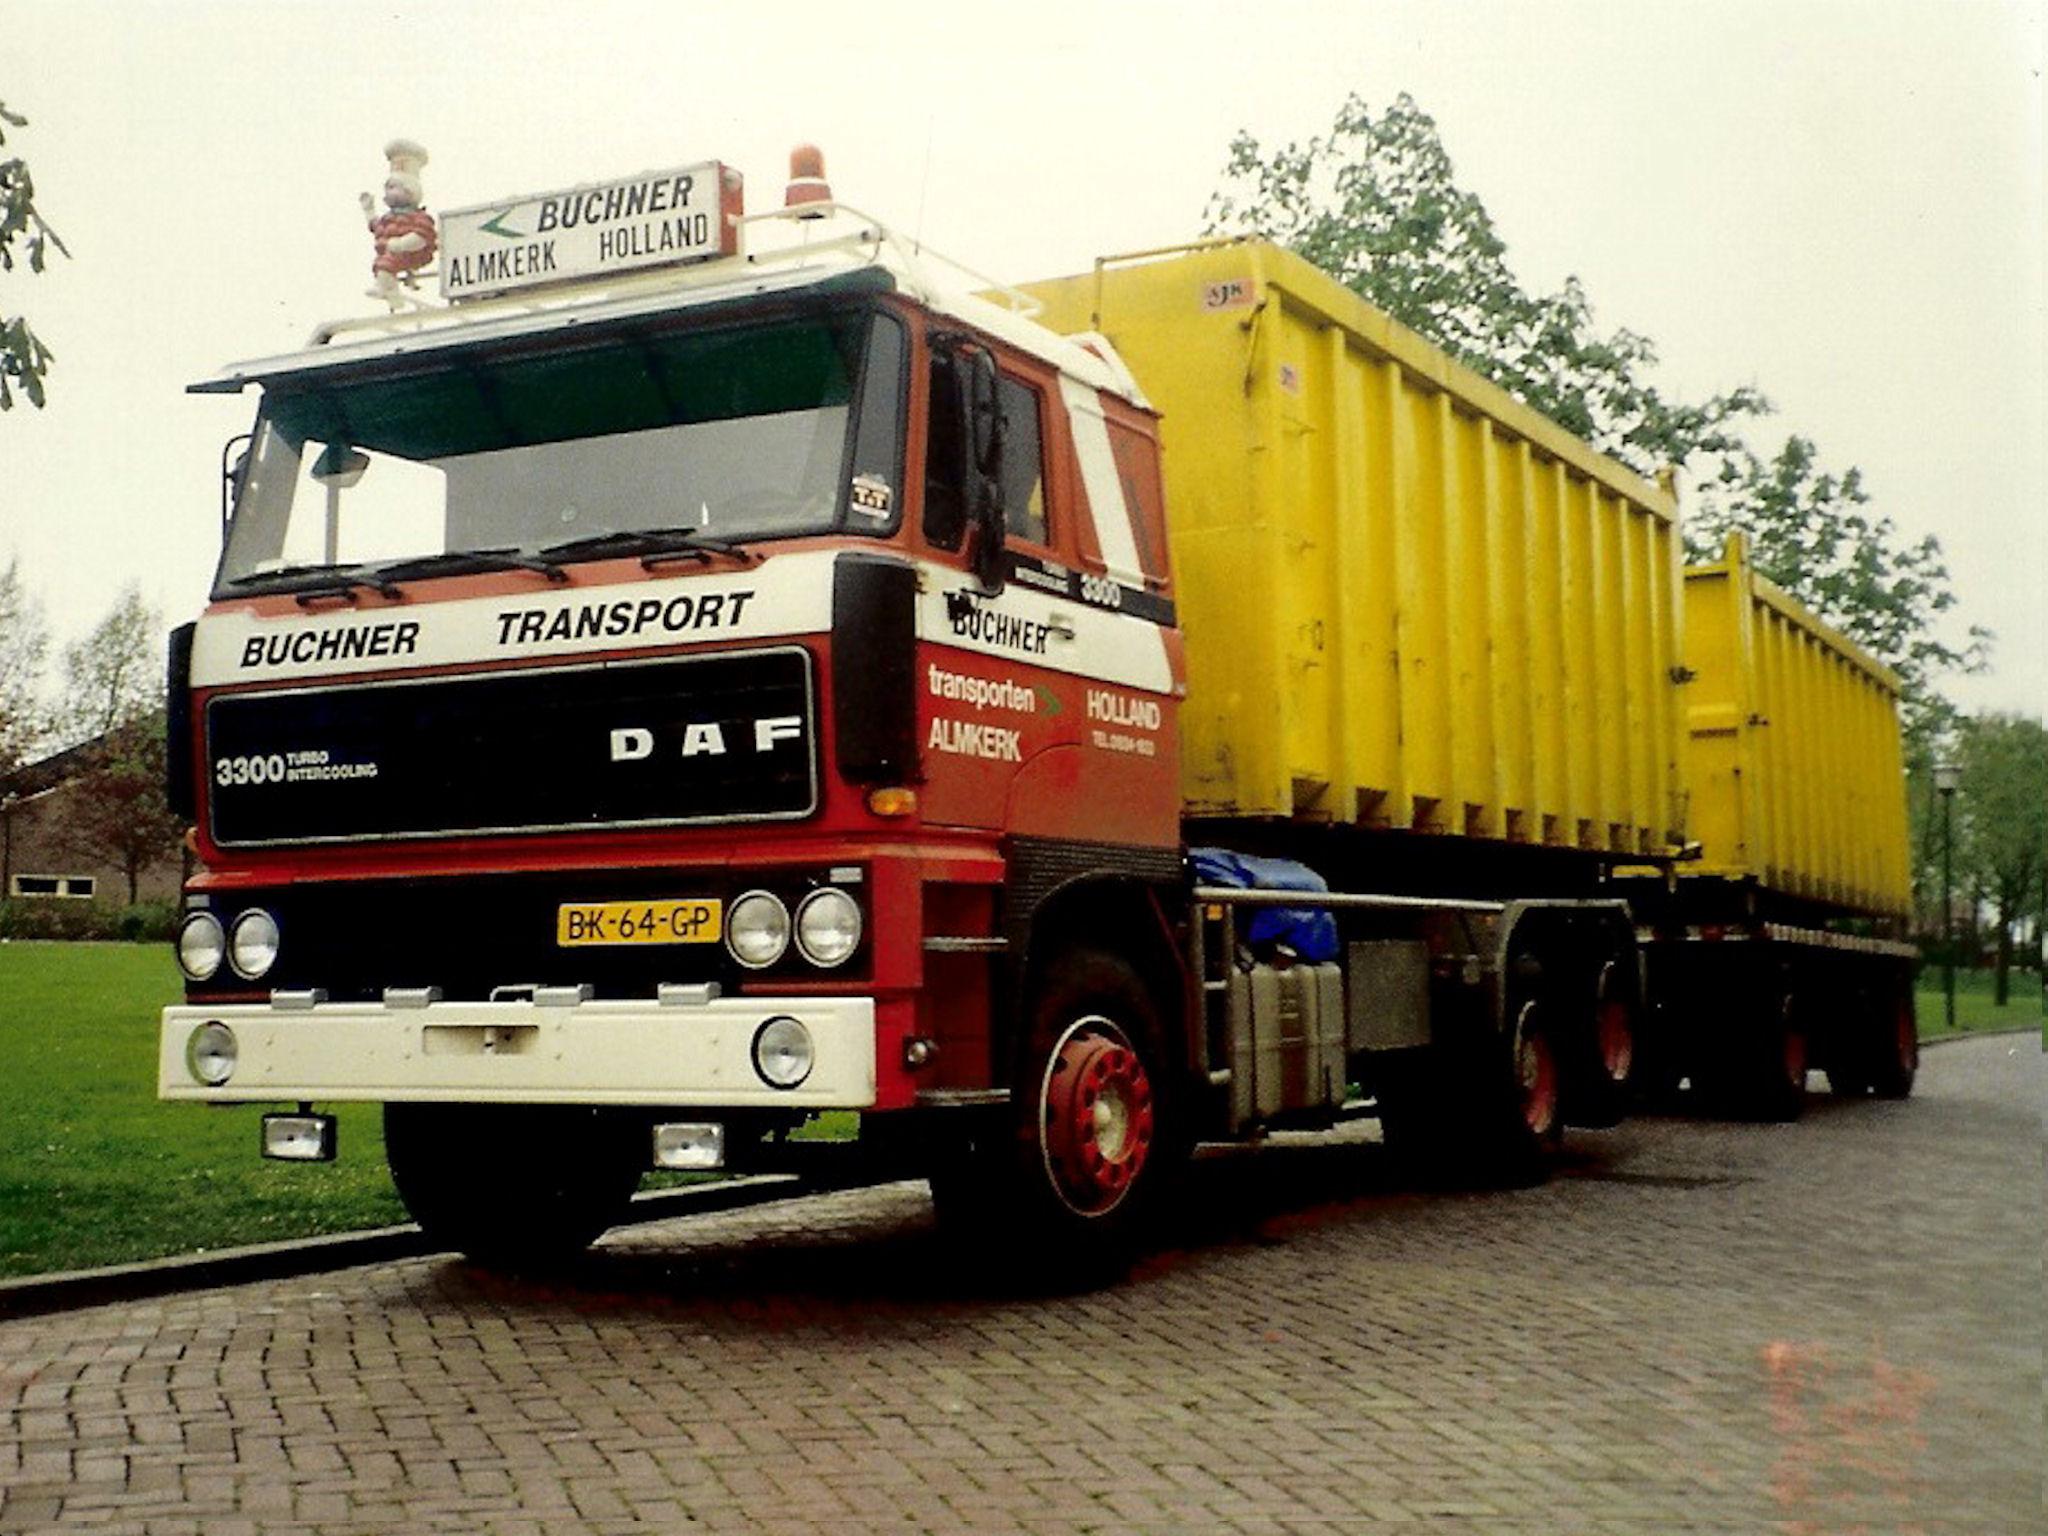 DAF-3300-John-Van-Andel-archief